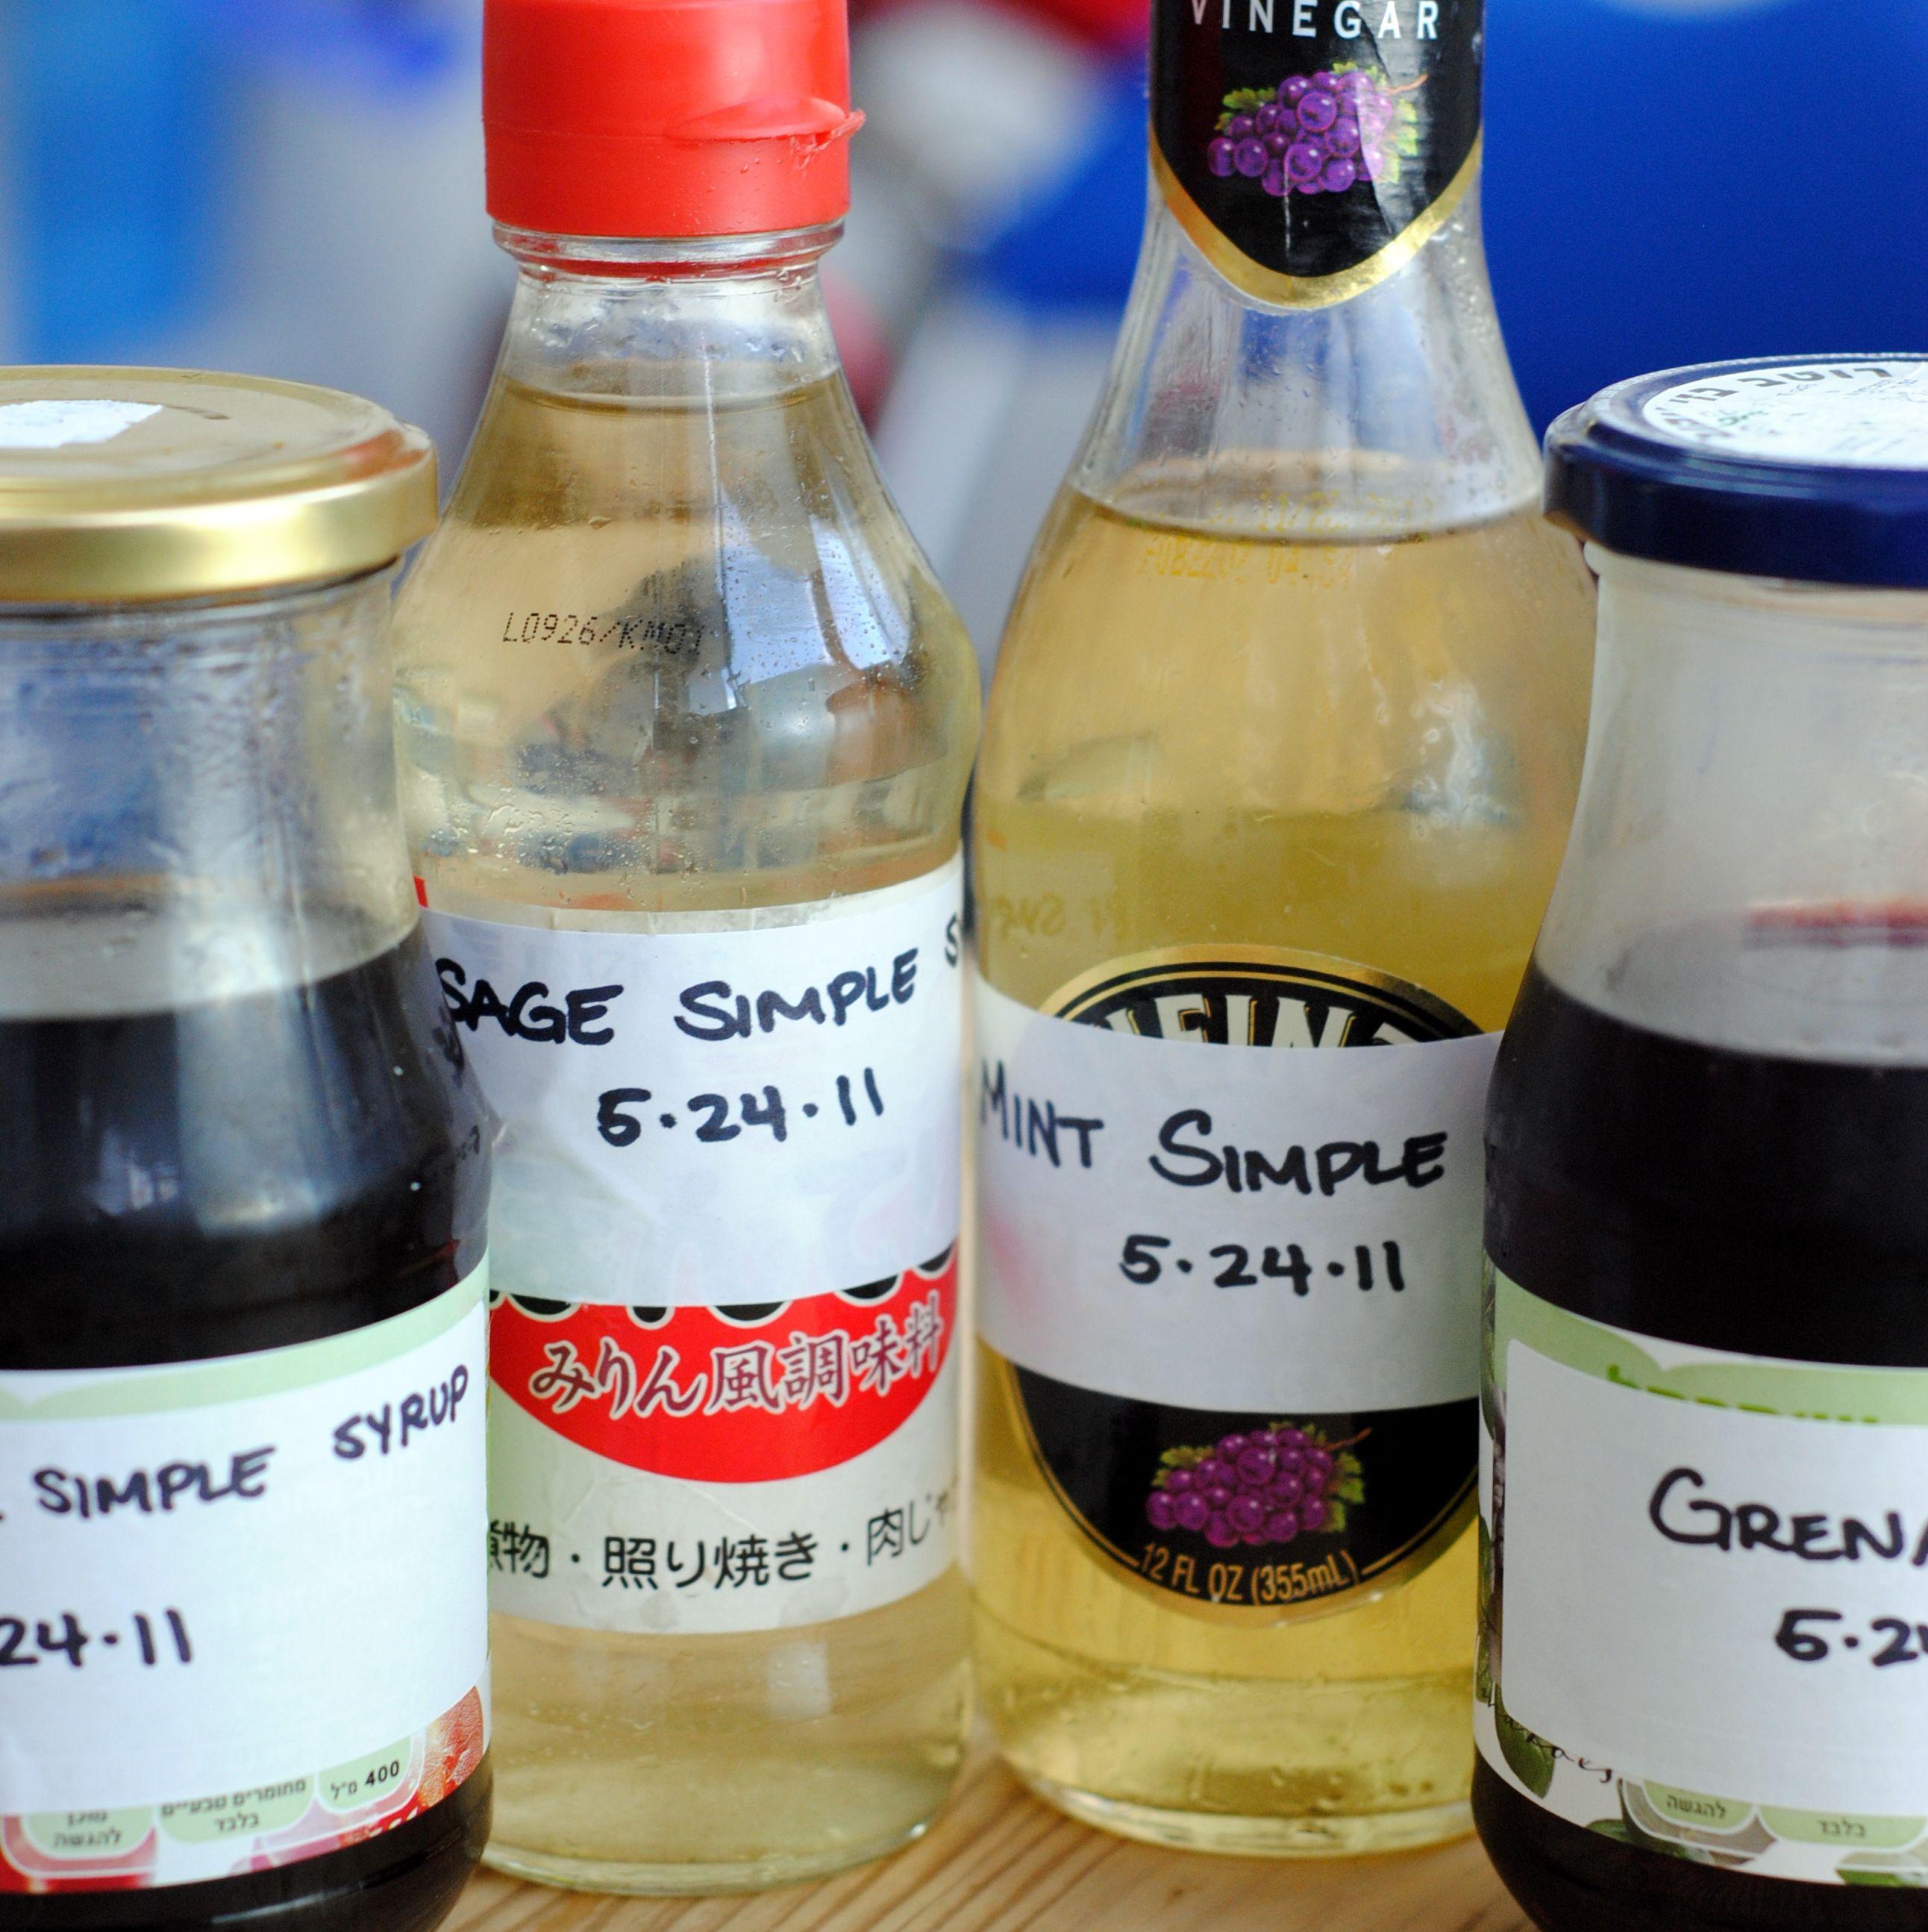 Plain Simple Syrup